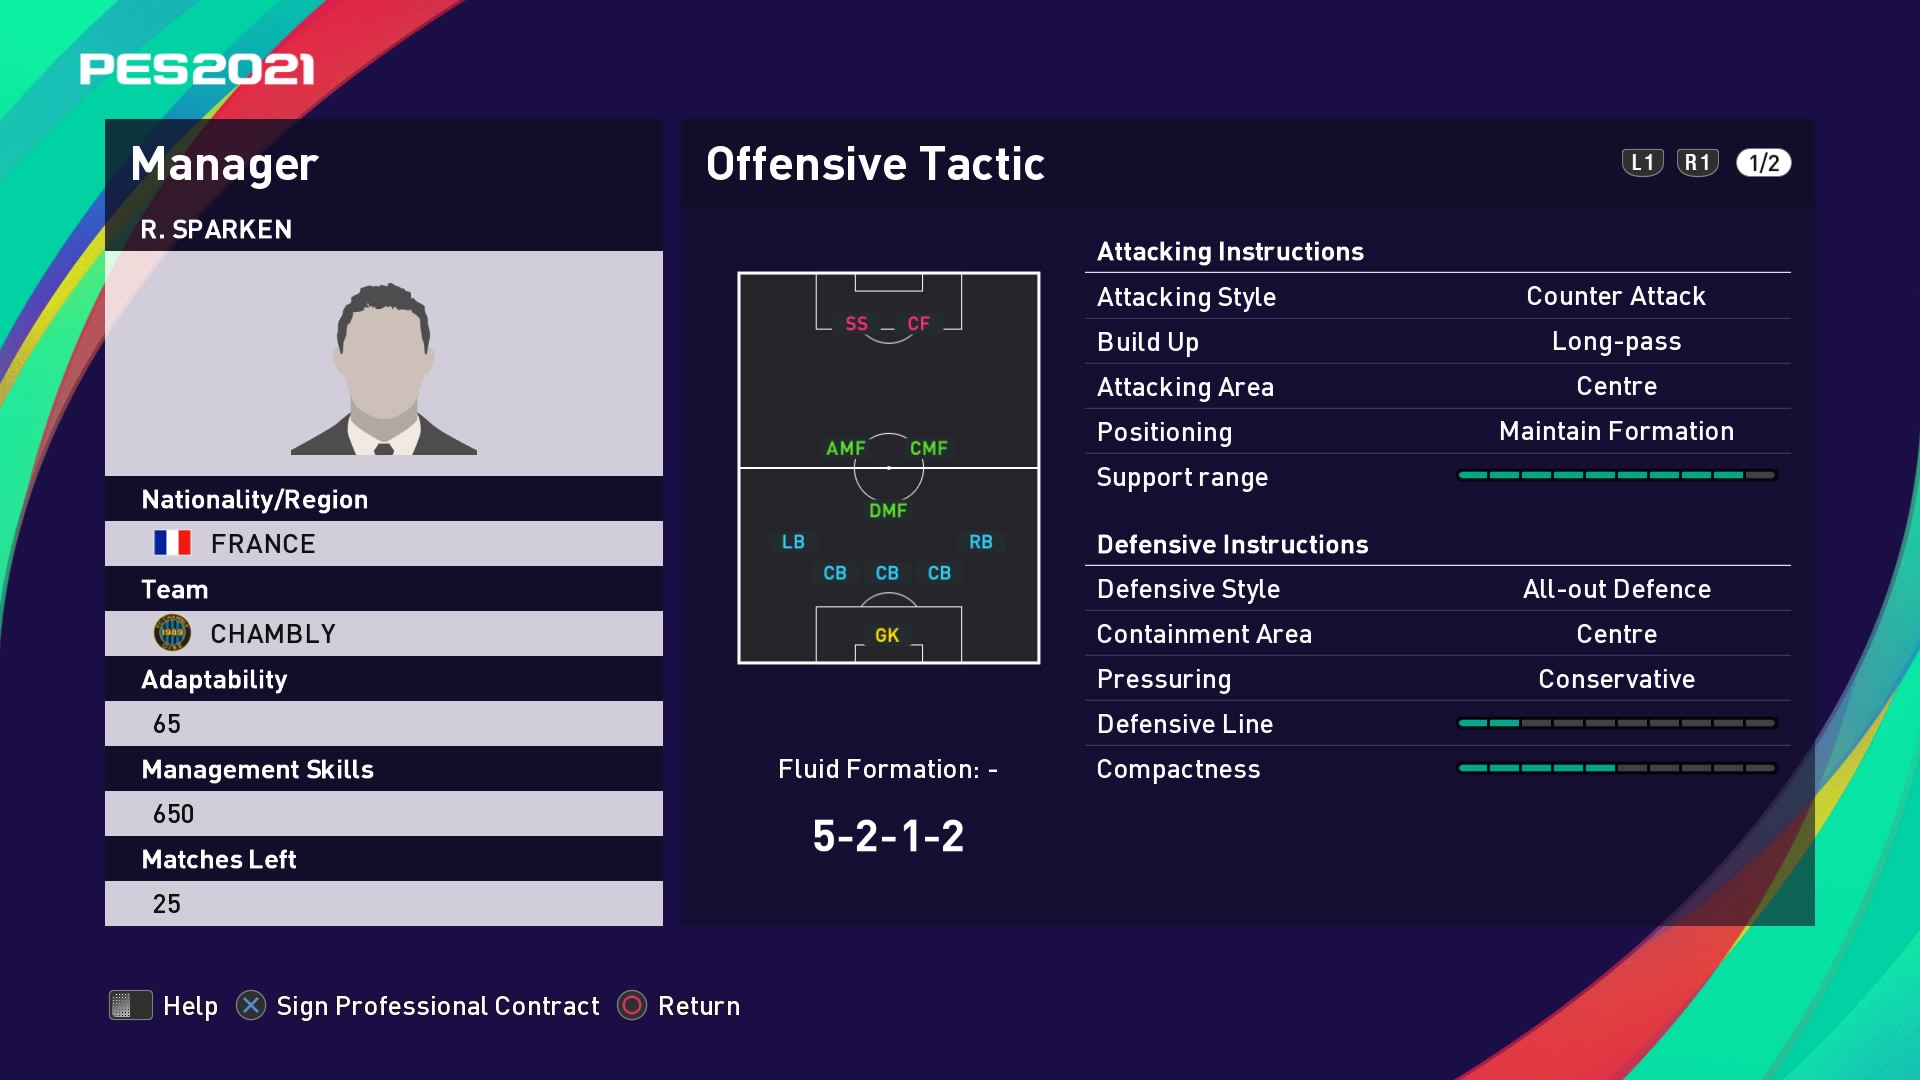 R. Sparken (Bruno Luzi) Offensive Tactic in PES 2021 myClub